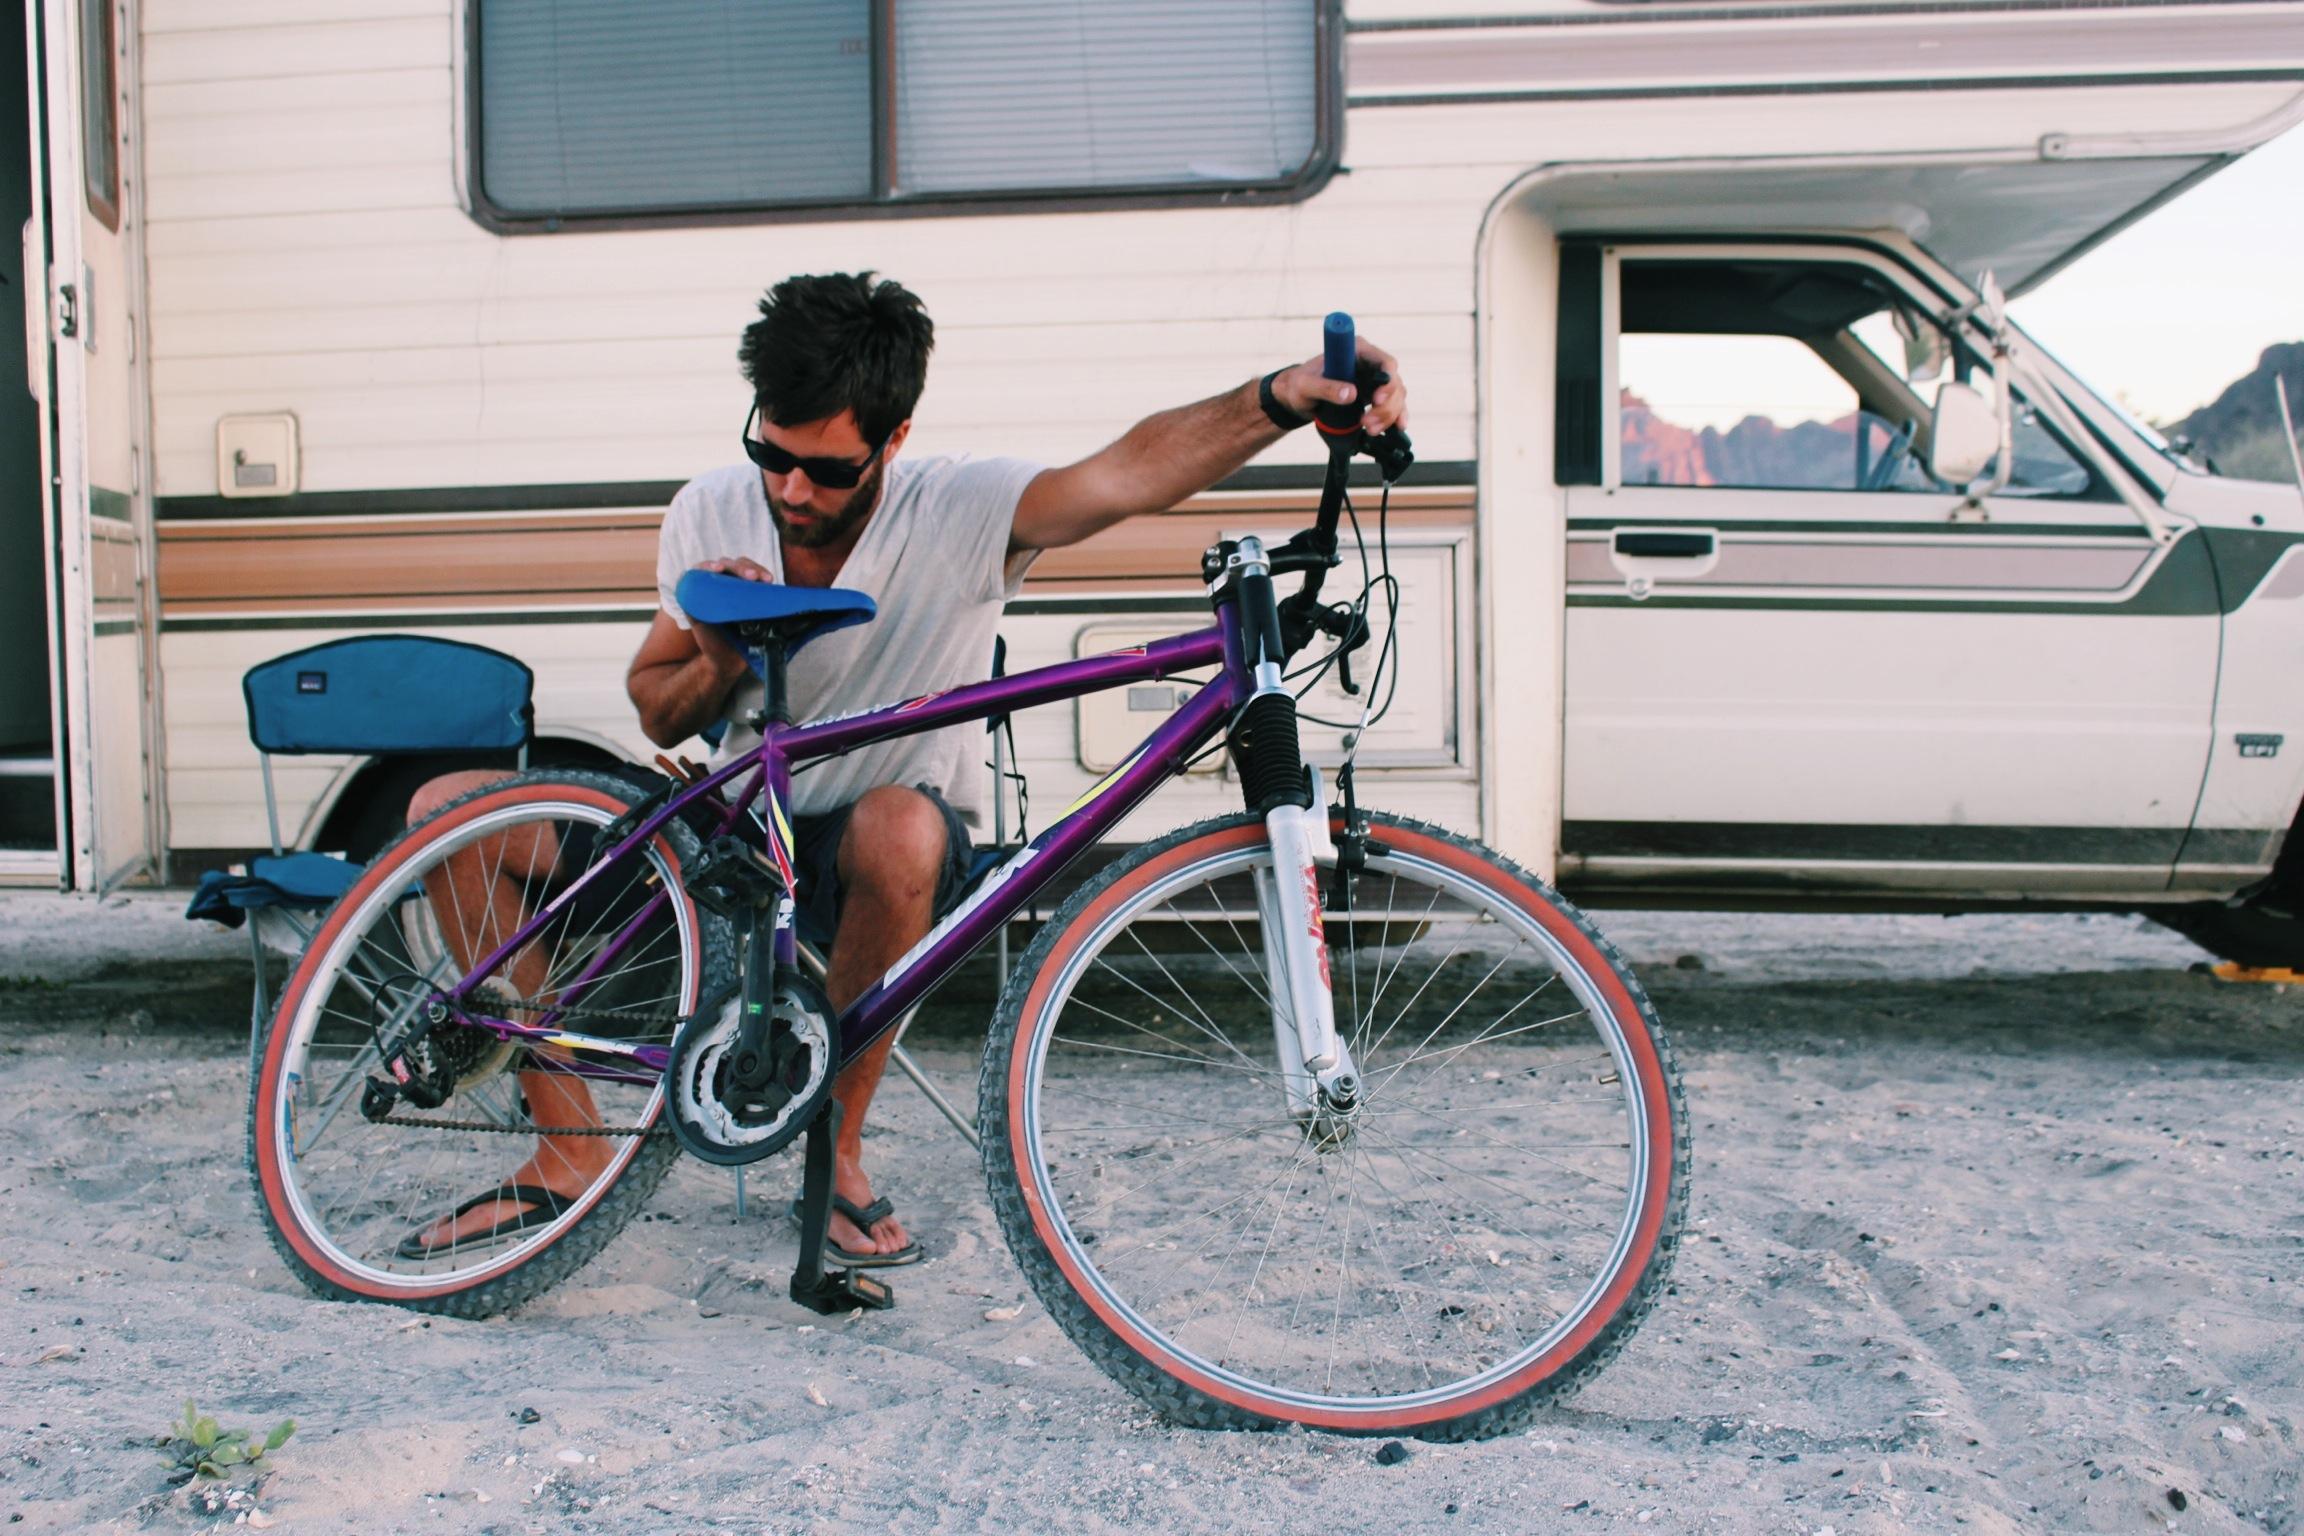 Adjusting the gears on Jacqui's new bike.